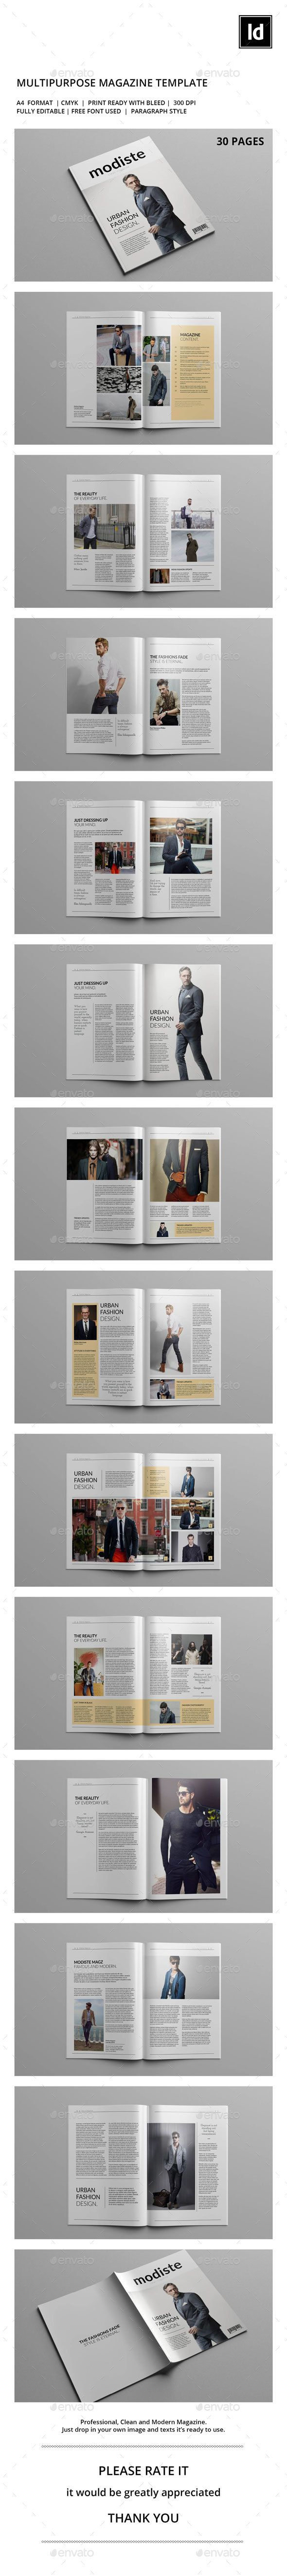 Modiste Magazine Template InDesign INDD. Download here: https://graphicriver.net/item/modiste-magazine-template/17309093?ref=ksioks